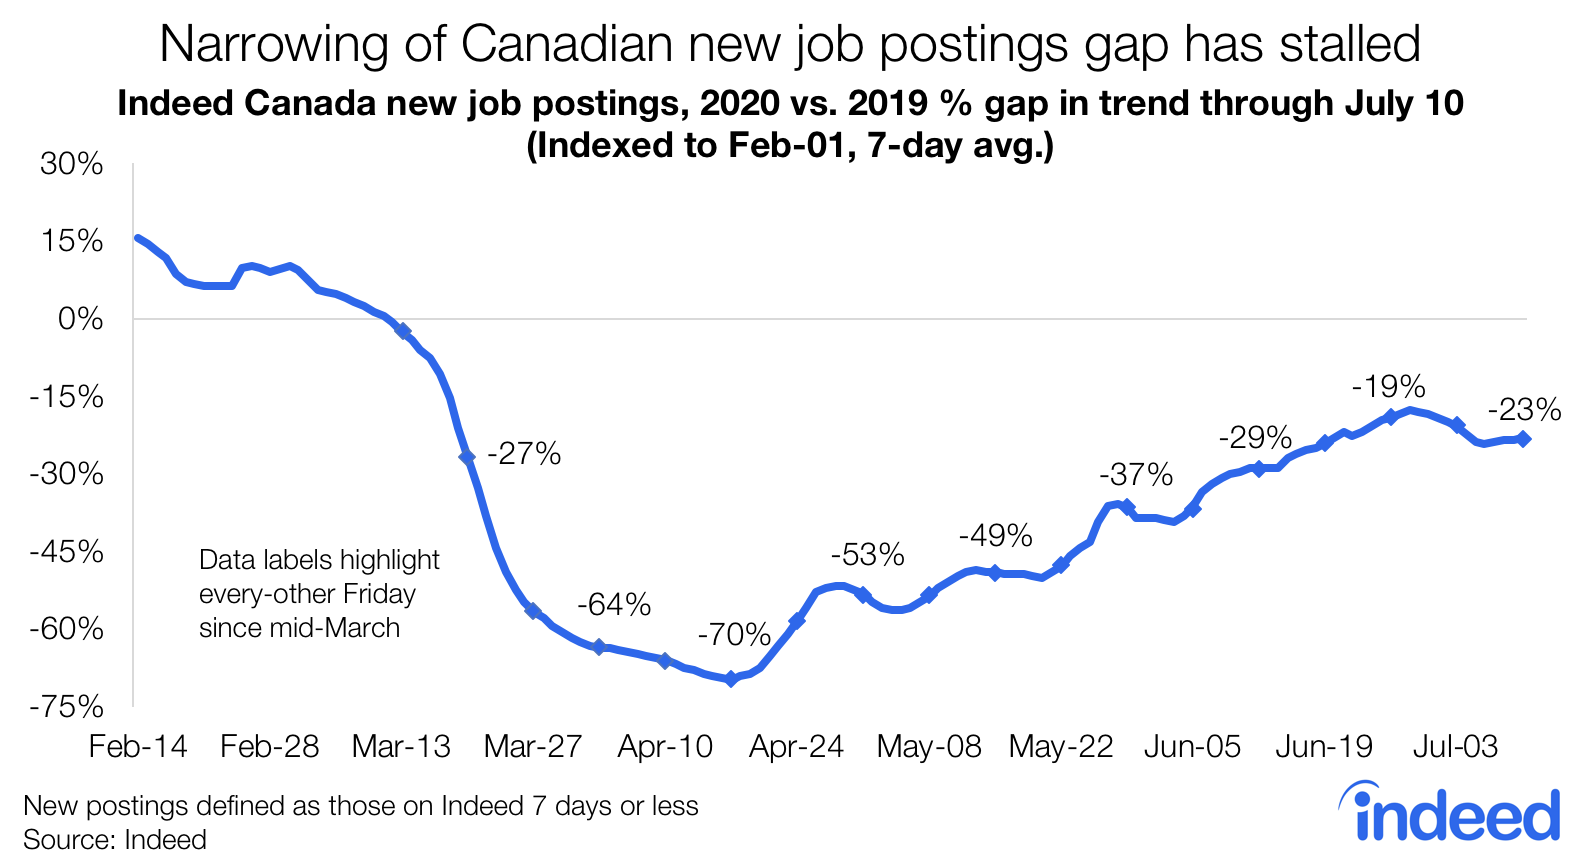 Narrowing of Canadian new job postings gap has stalled